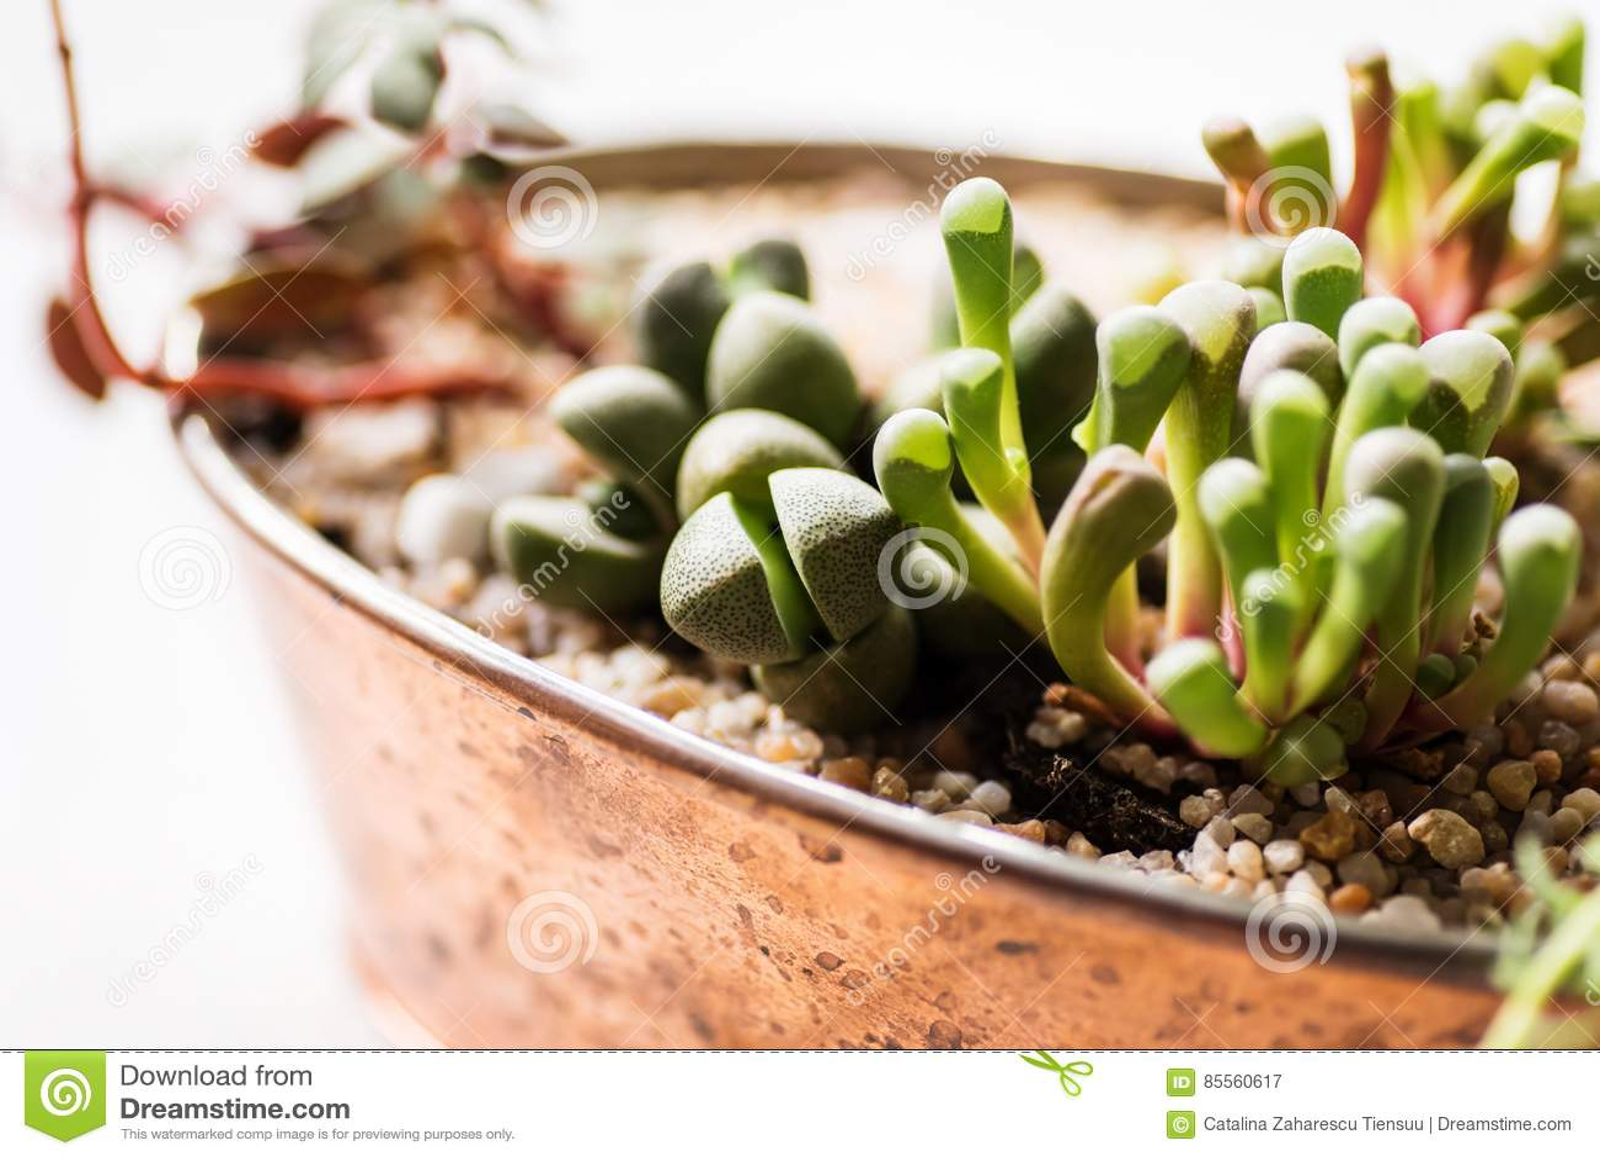 Mini garden in a copper pot